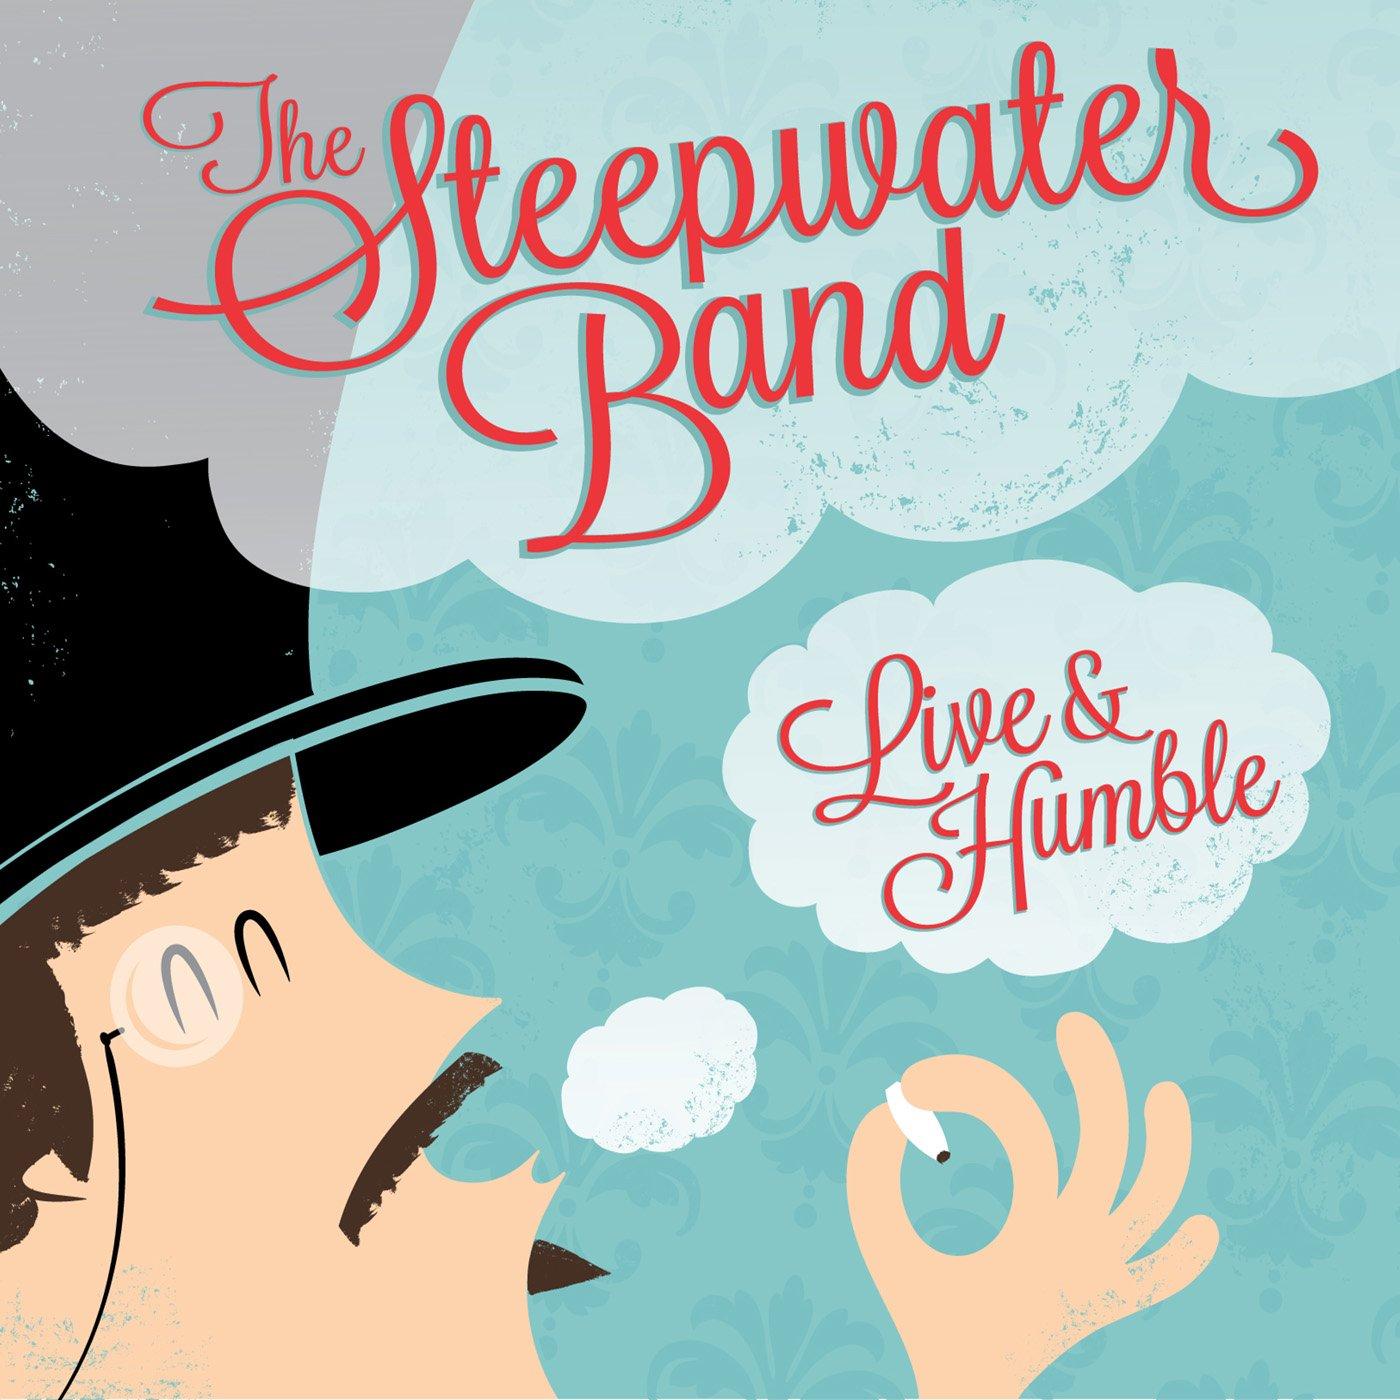 Steepwater Band - Página 8 71ZnpUQvOtL._SL1400_